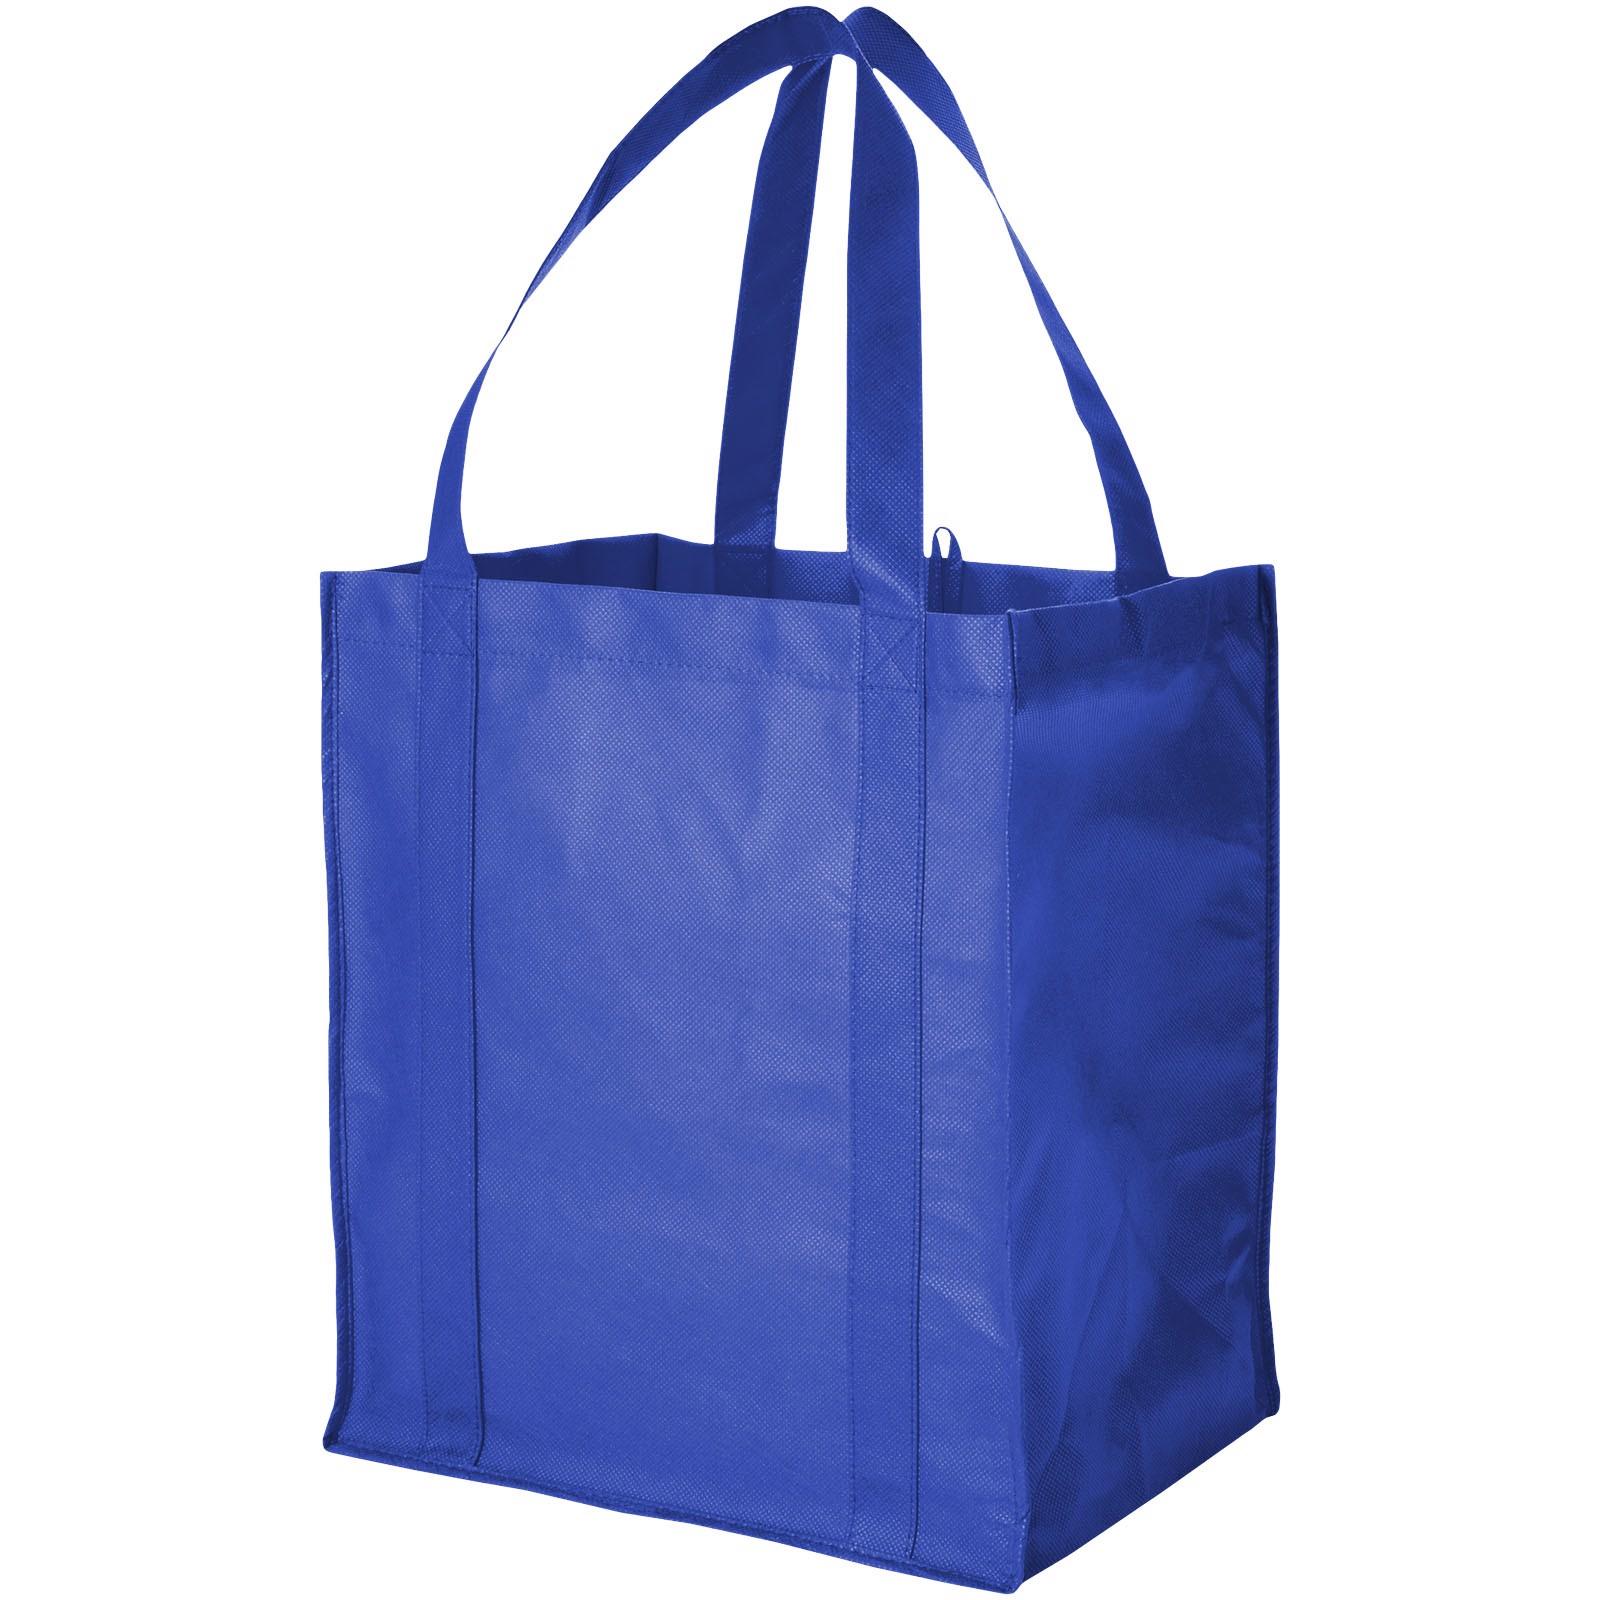 Liberty bottom board non-woven tote bag - Royal blue